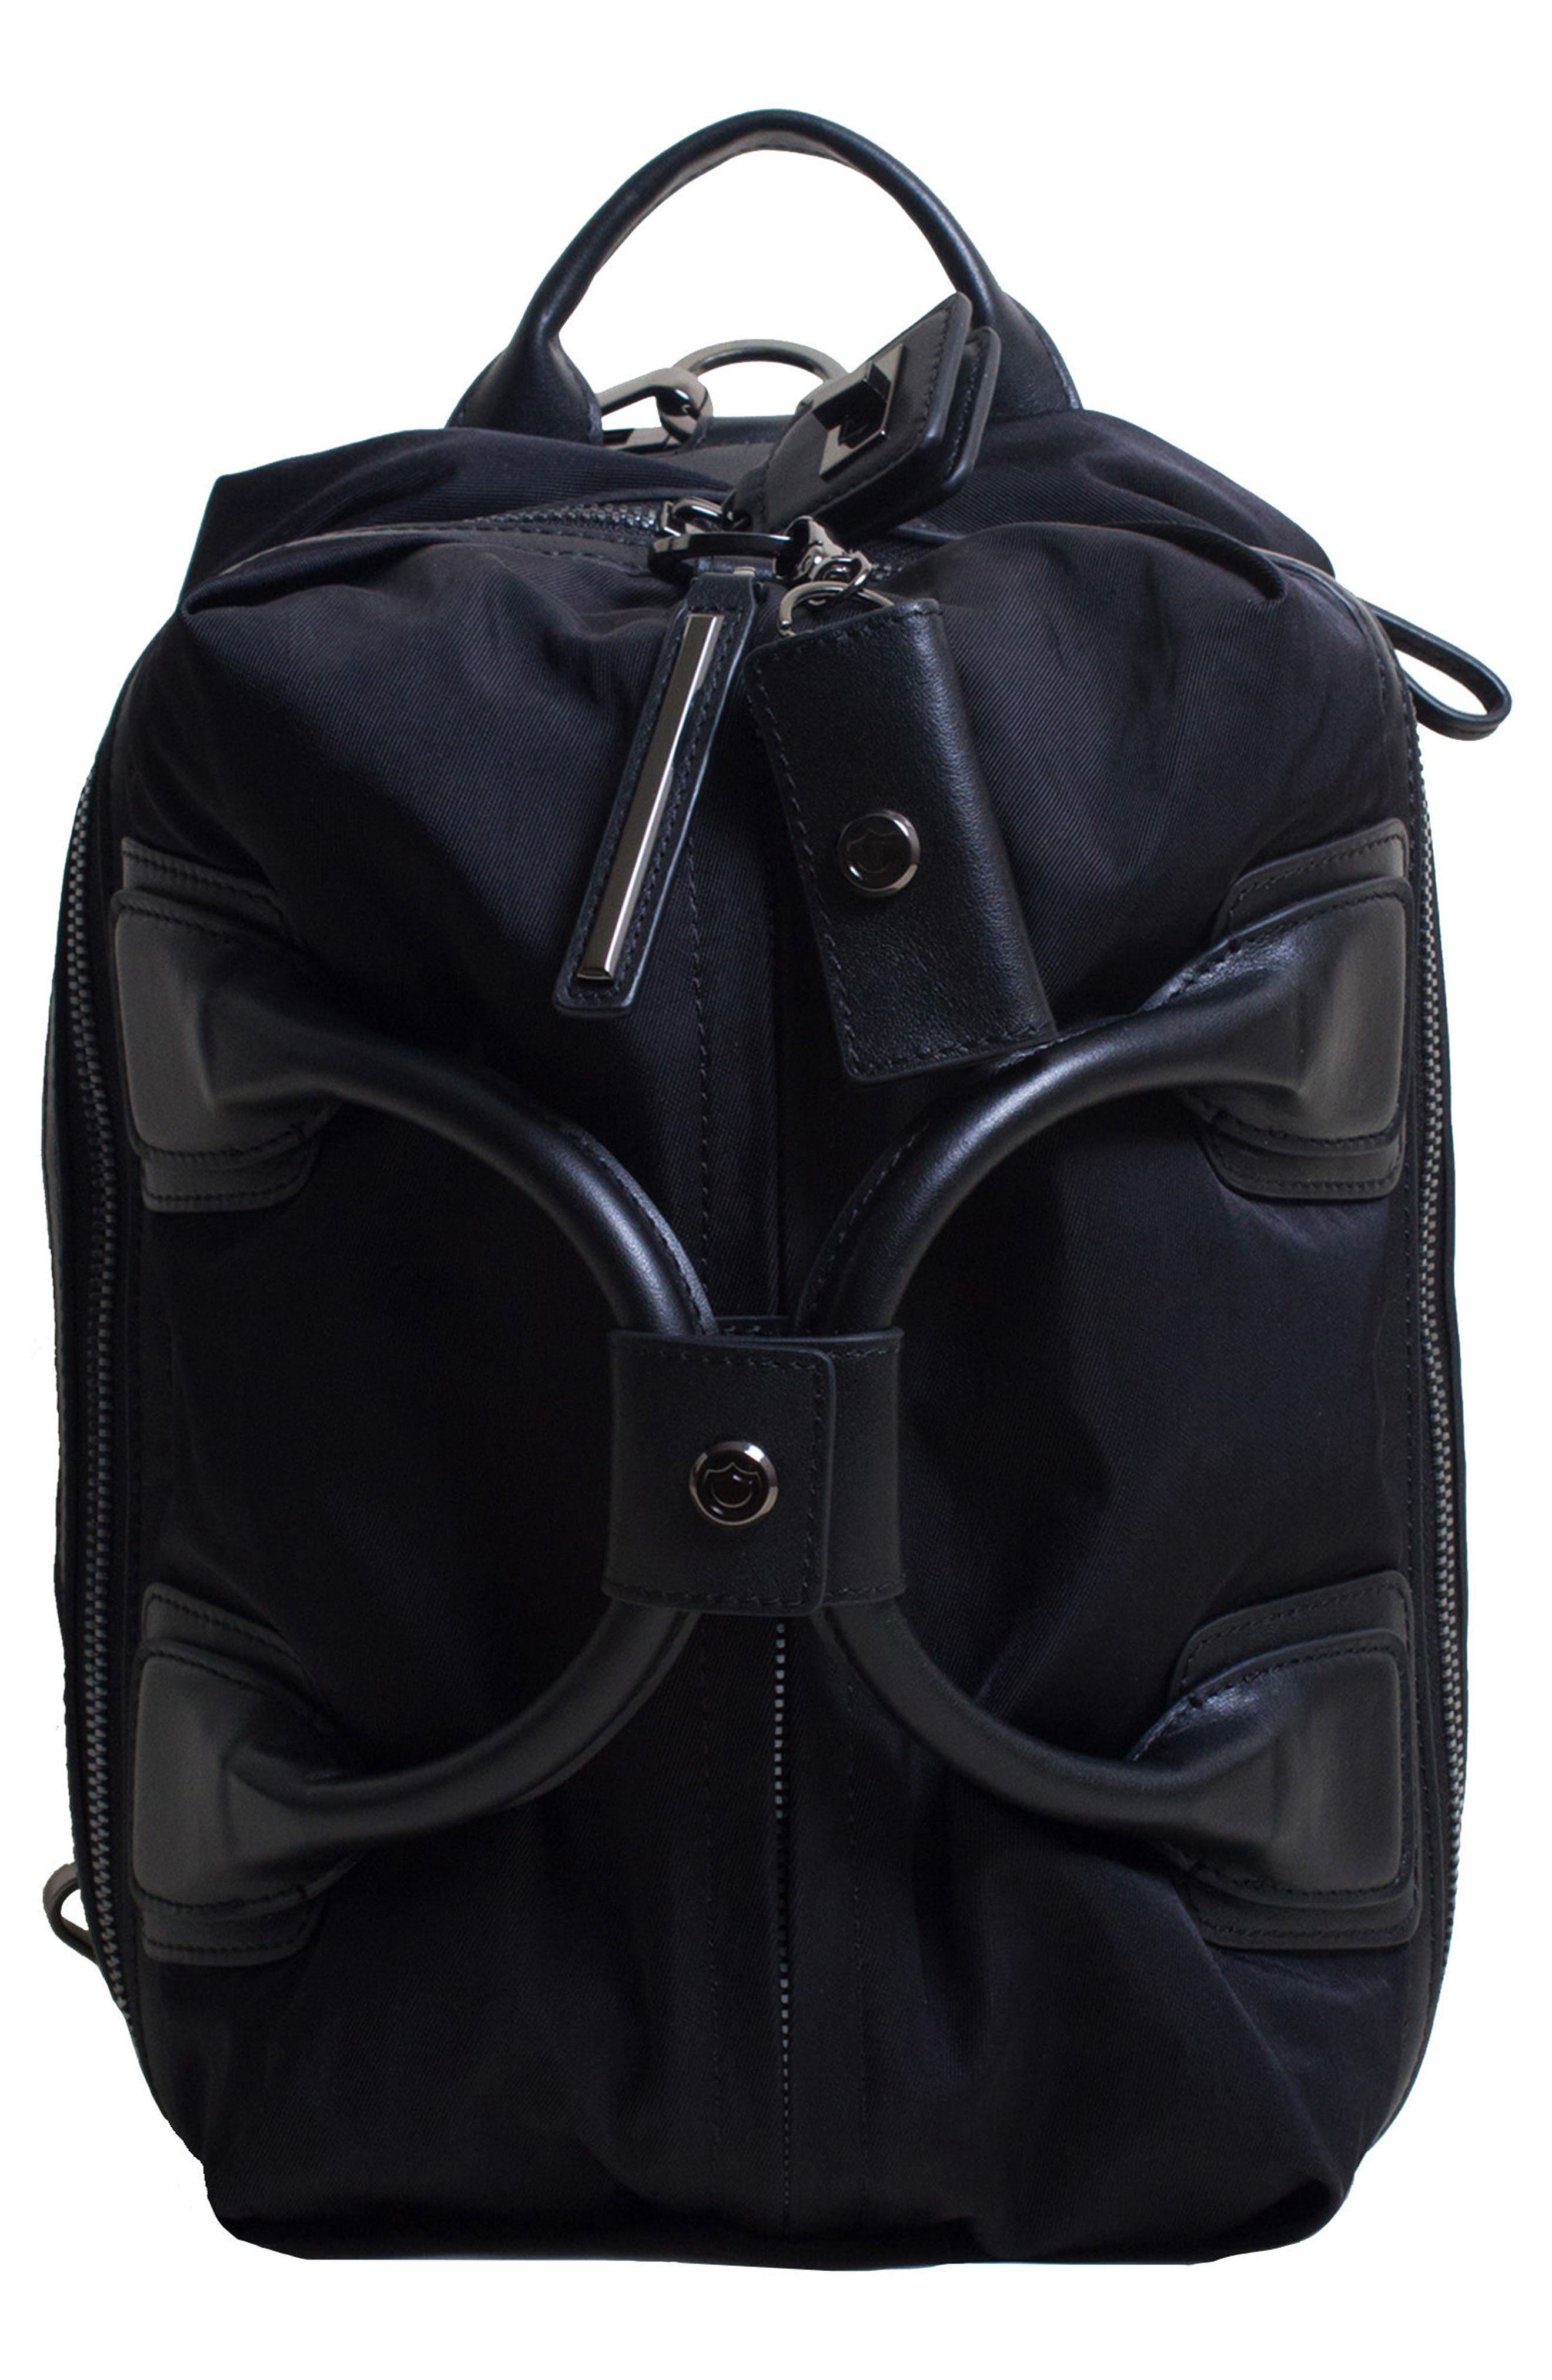 Studio Medium Duffel Backpack,                             Main thumbnail 1, color,                             001